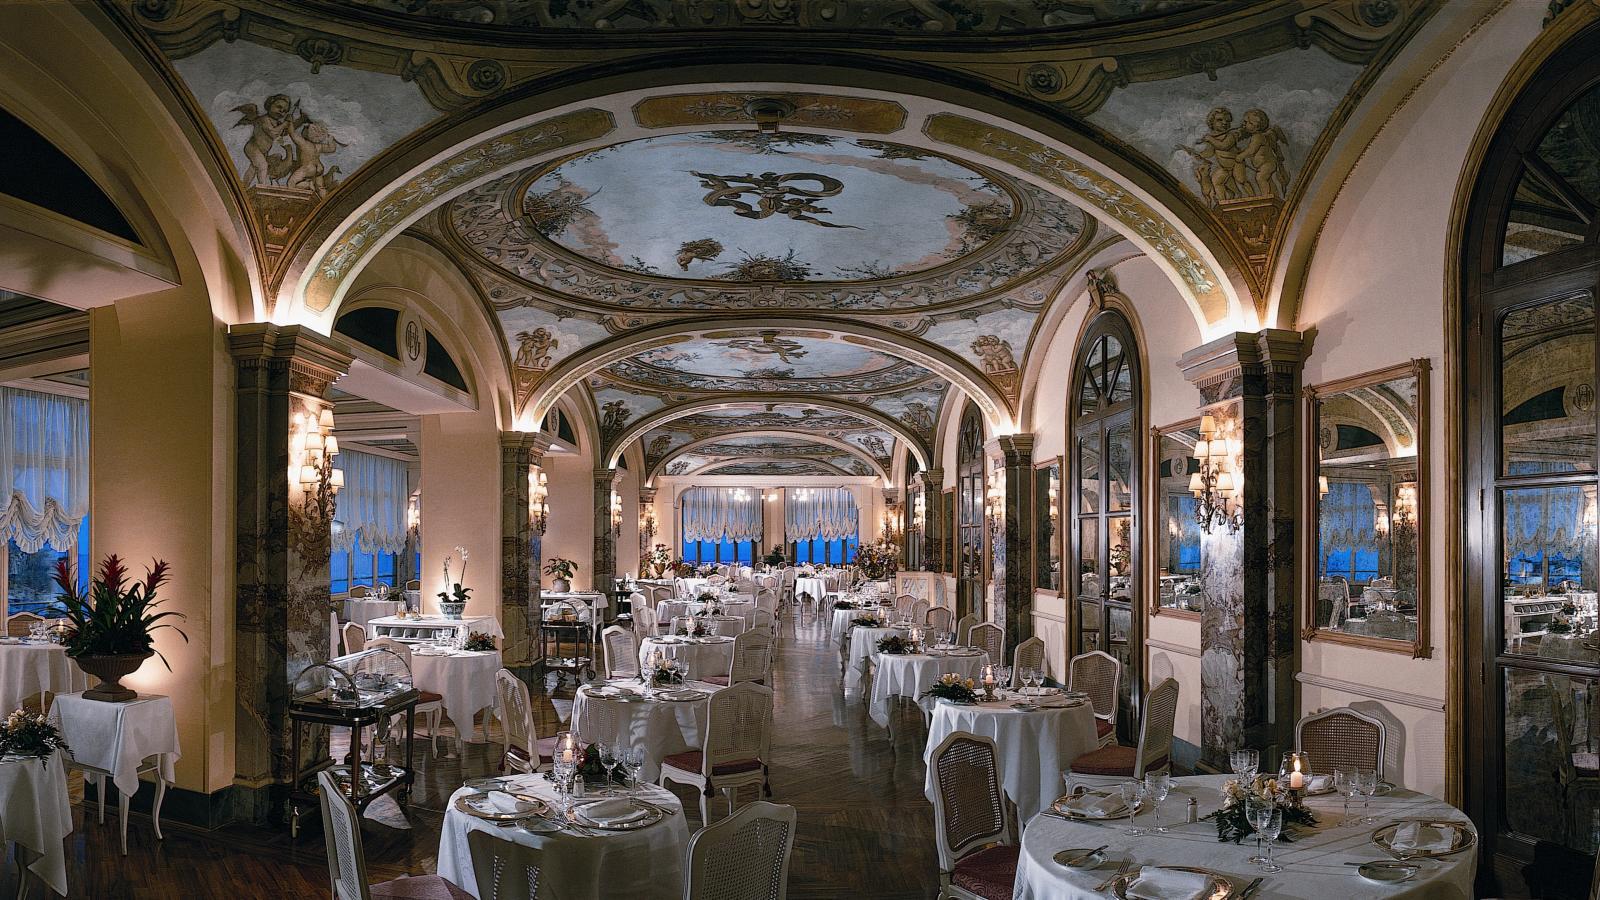 Grand Hotel Excelsior Vittoria Sorrento Bay of Naples